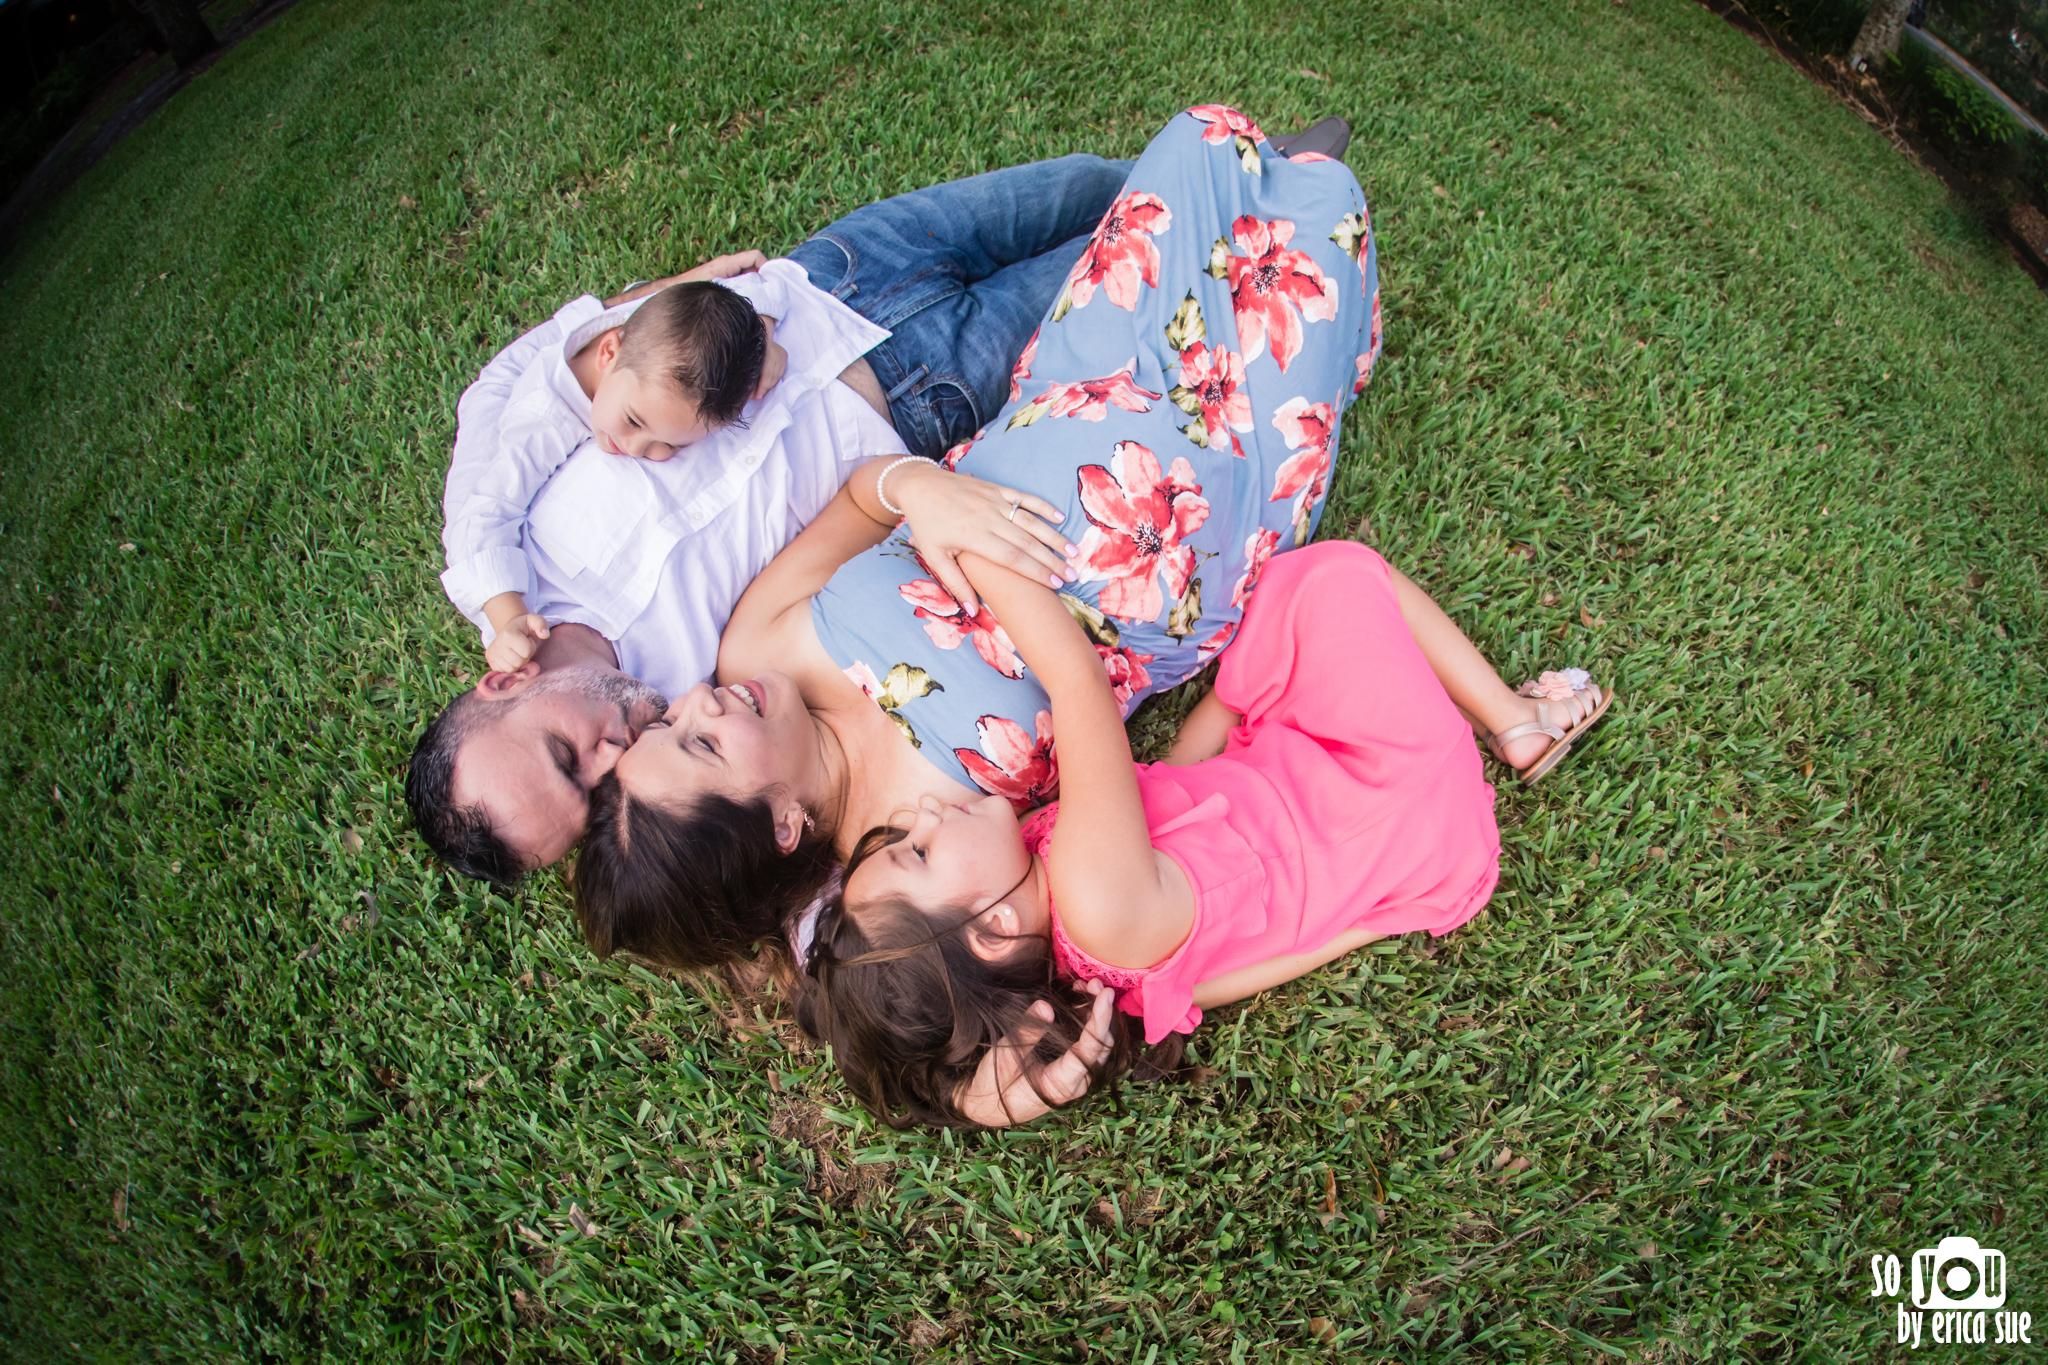 so-you-by-erica-sue-davie-maternity-photographer-fl-7047.jpg